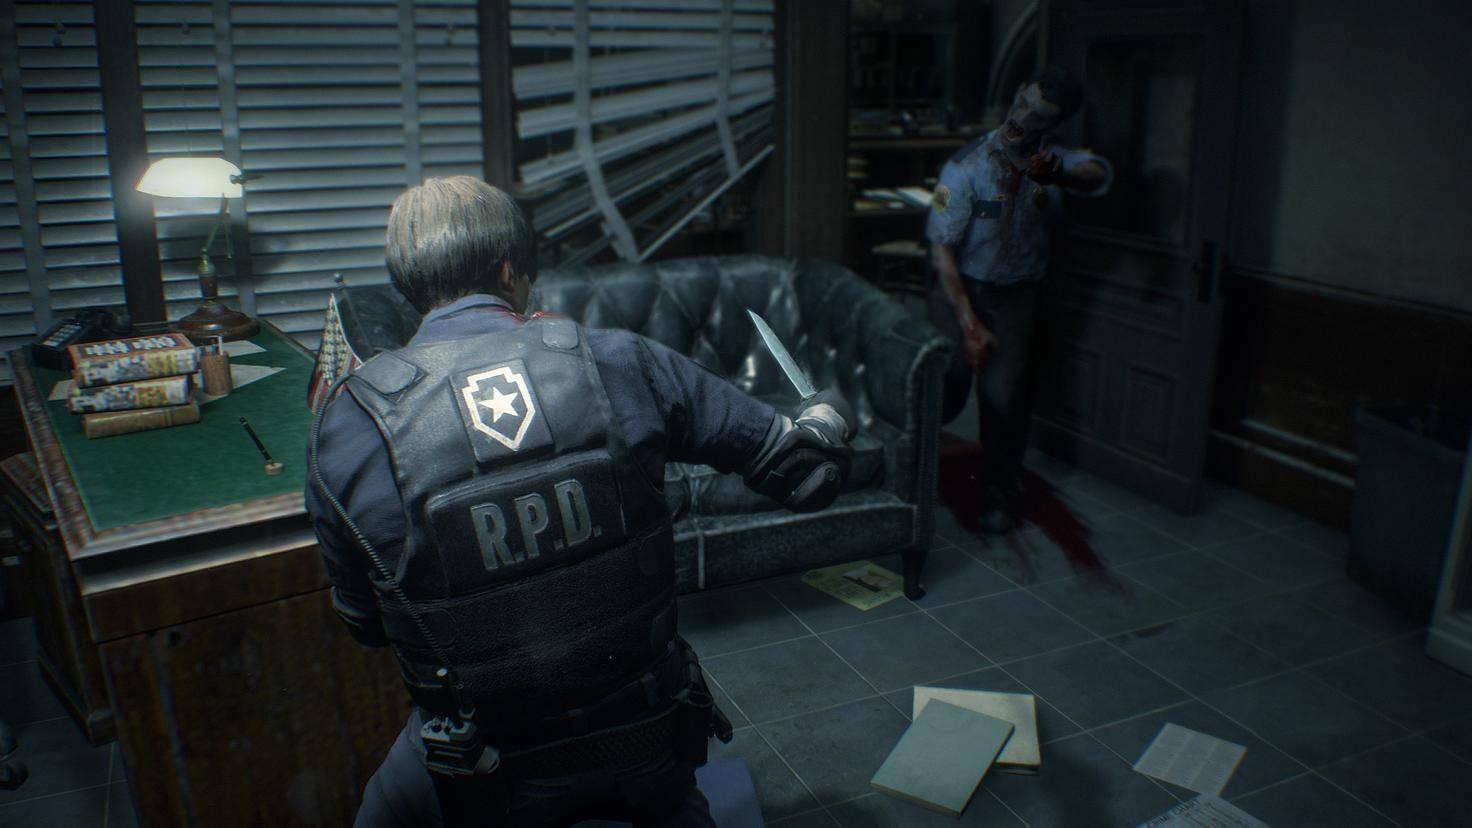 resident-evil-2-remake-screenshot-zombie-messer